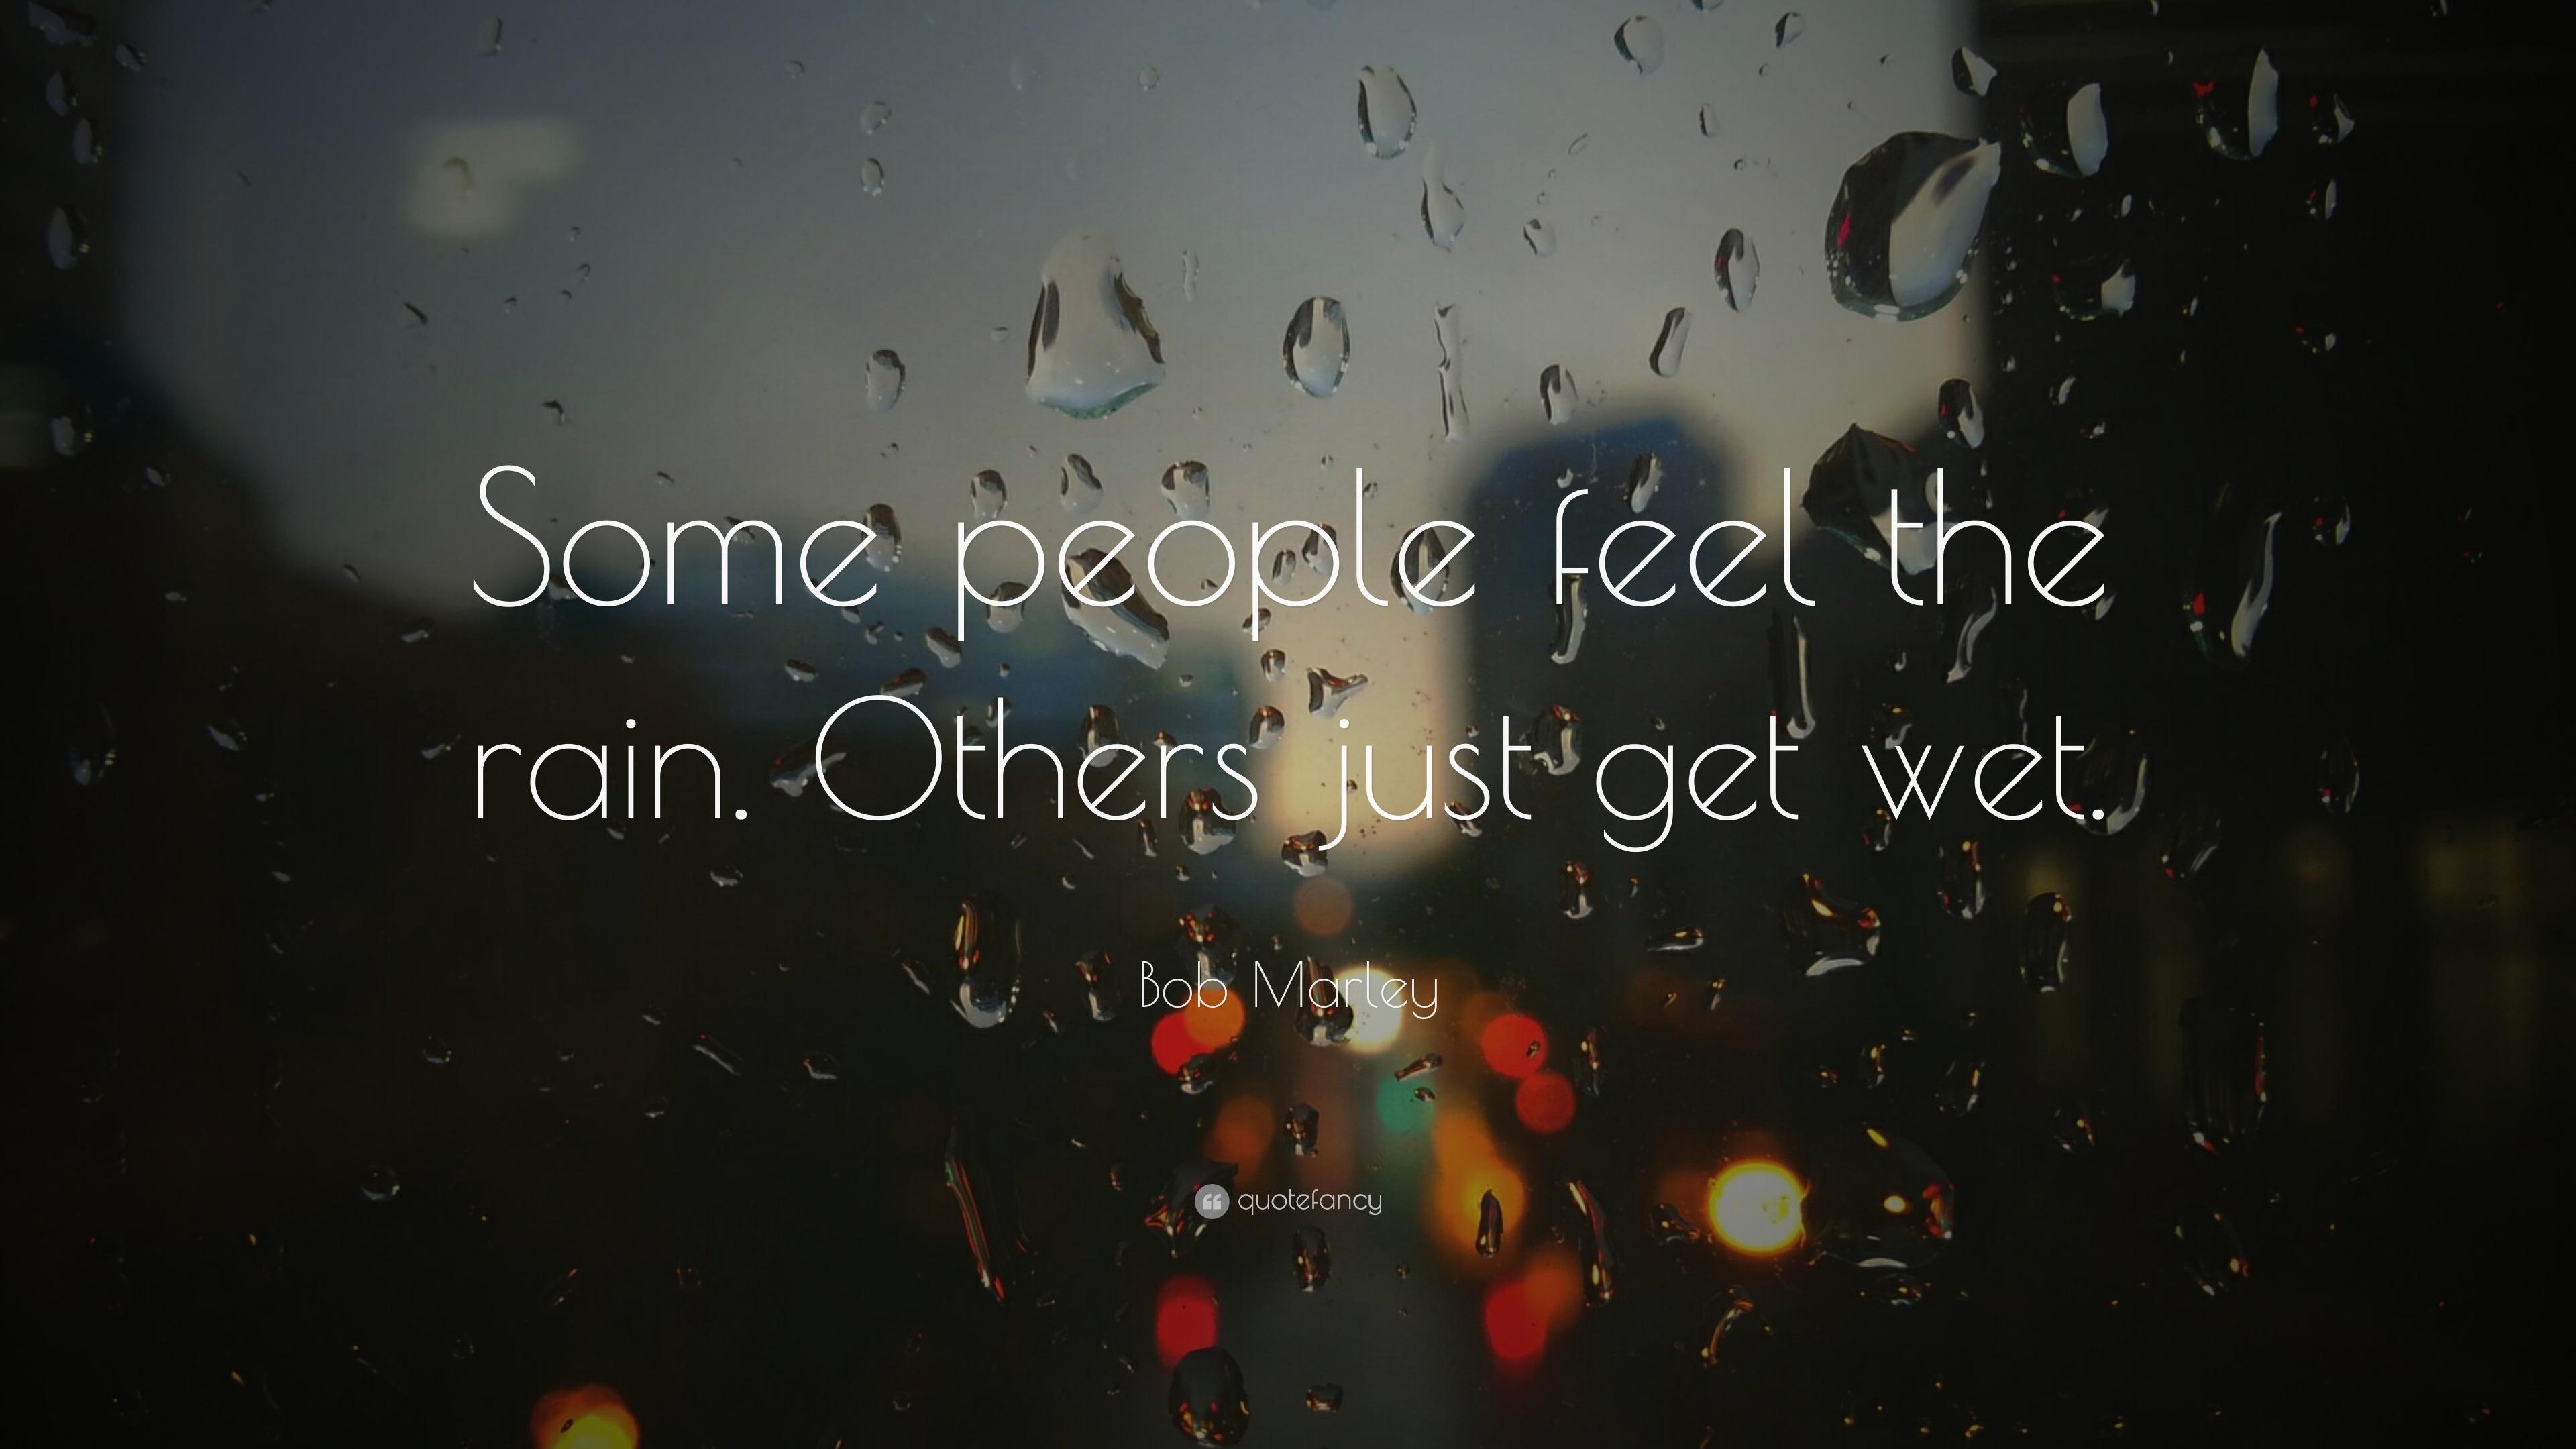 rain quotes wallpapers - photo #27